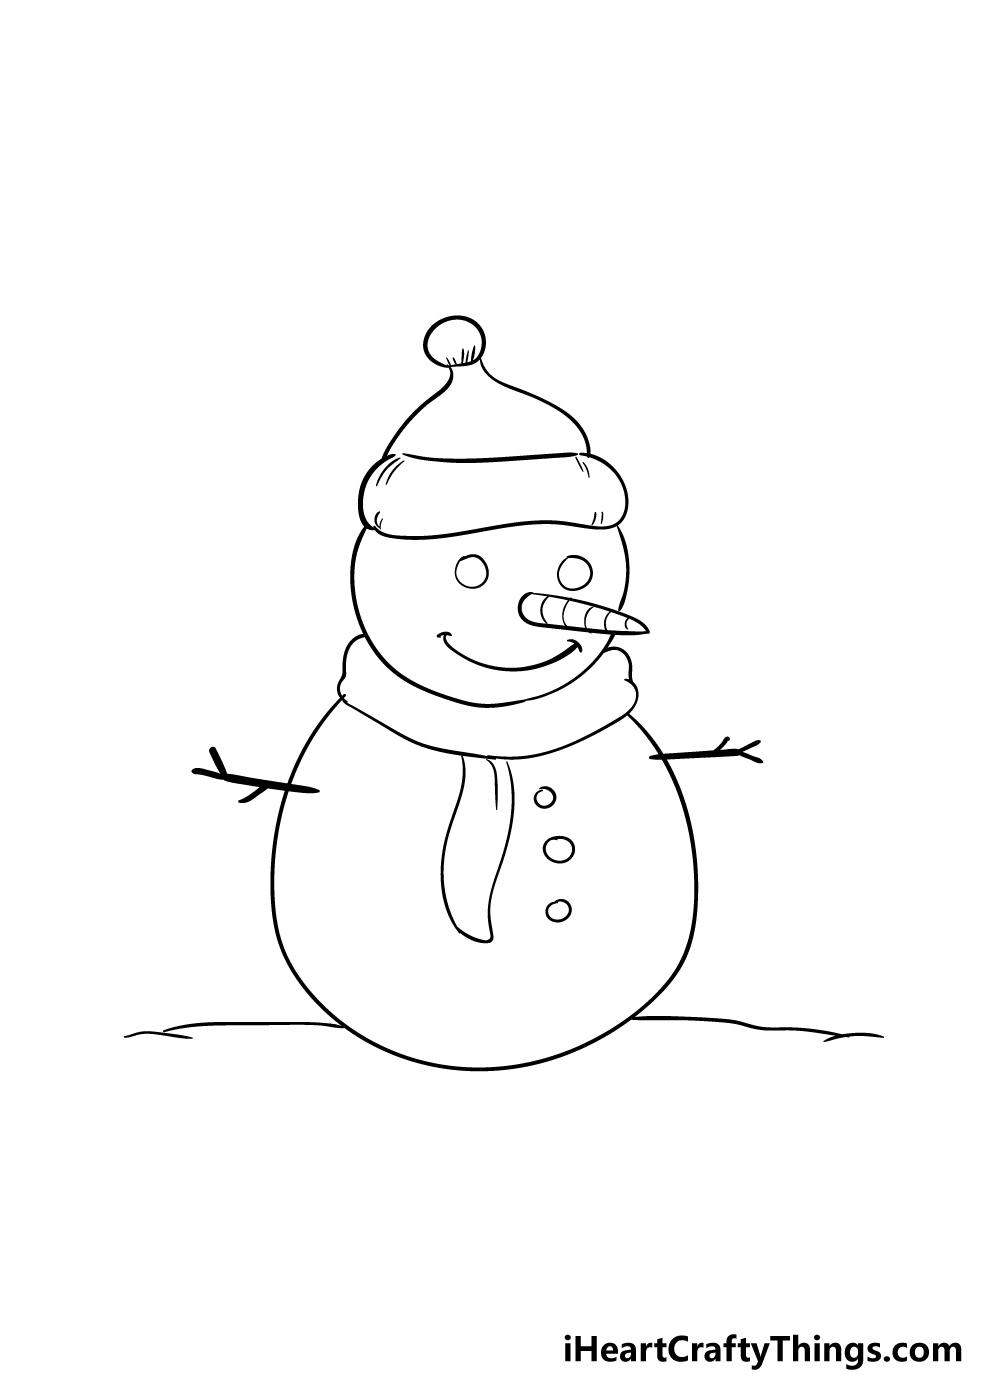 snowman drawing step 6